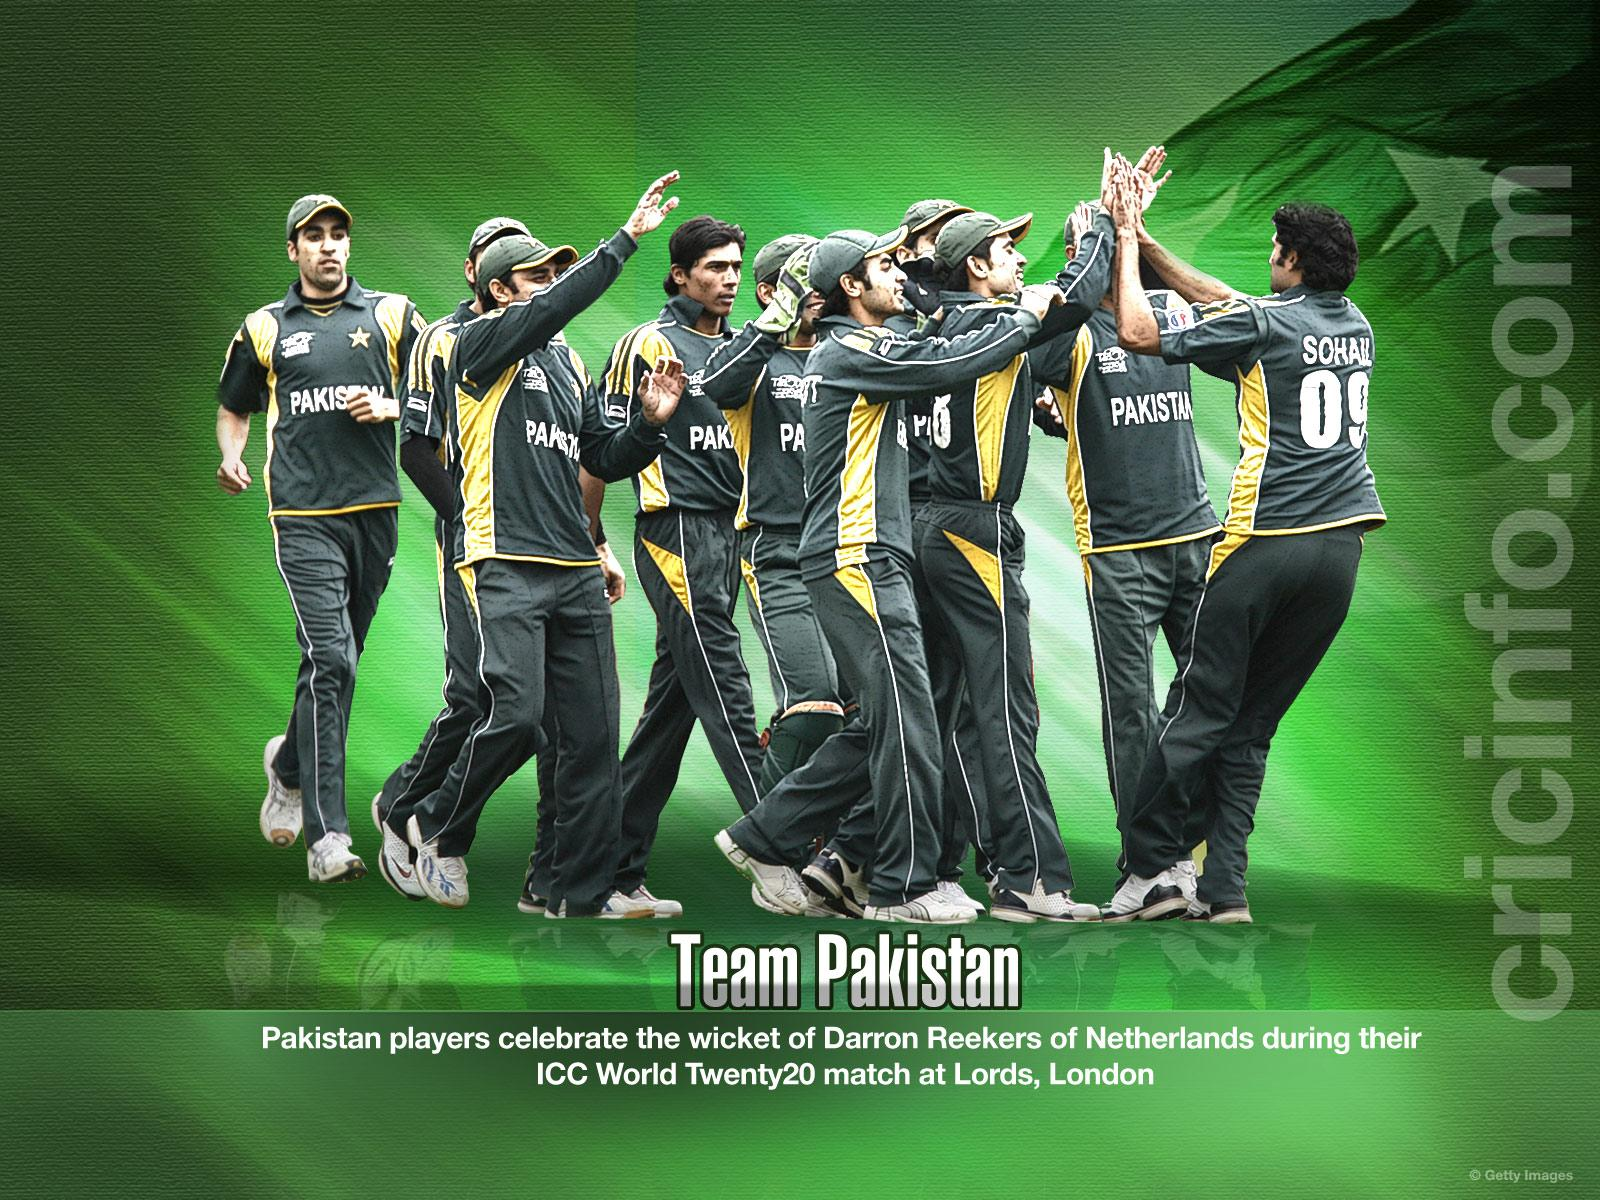 Pakistan Cricket Team Background 7